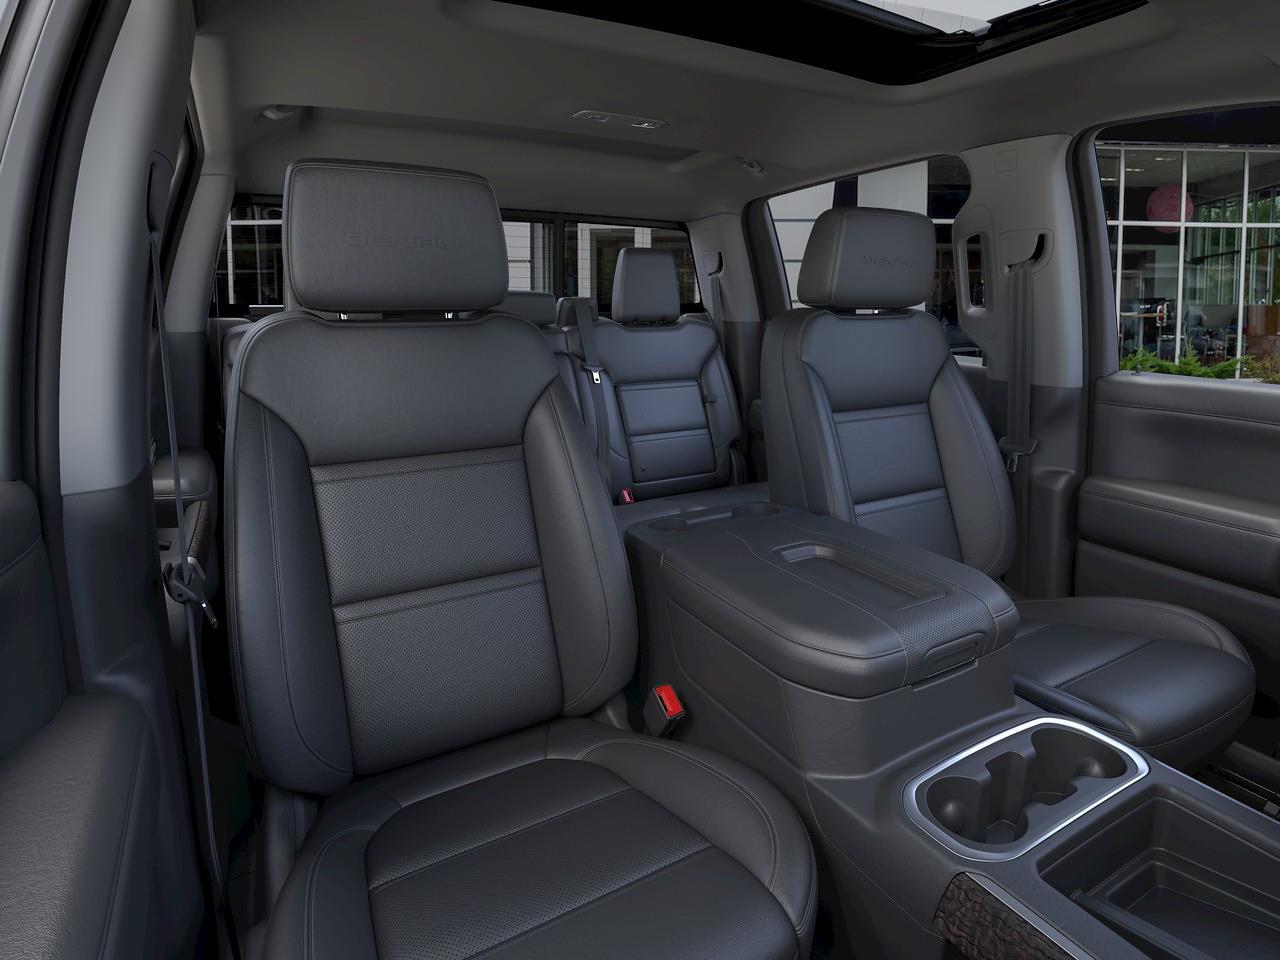 2021 GMC Sierra 1500 Crew Cab 4x4, Pickup #G21420 - photo 13